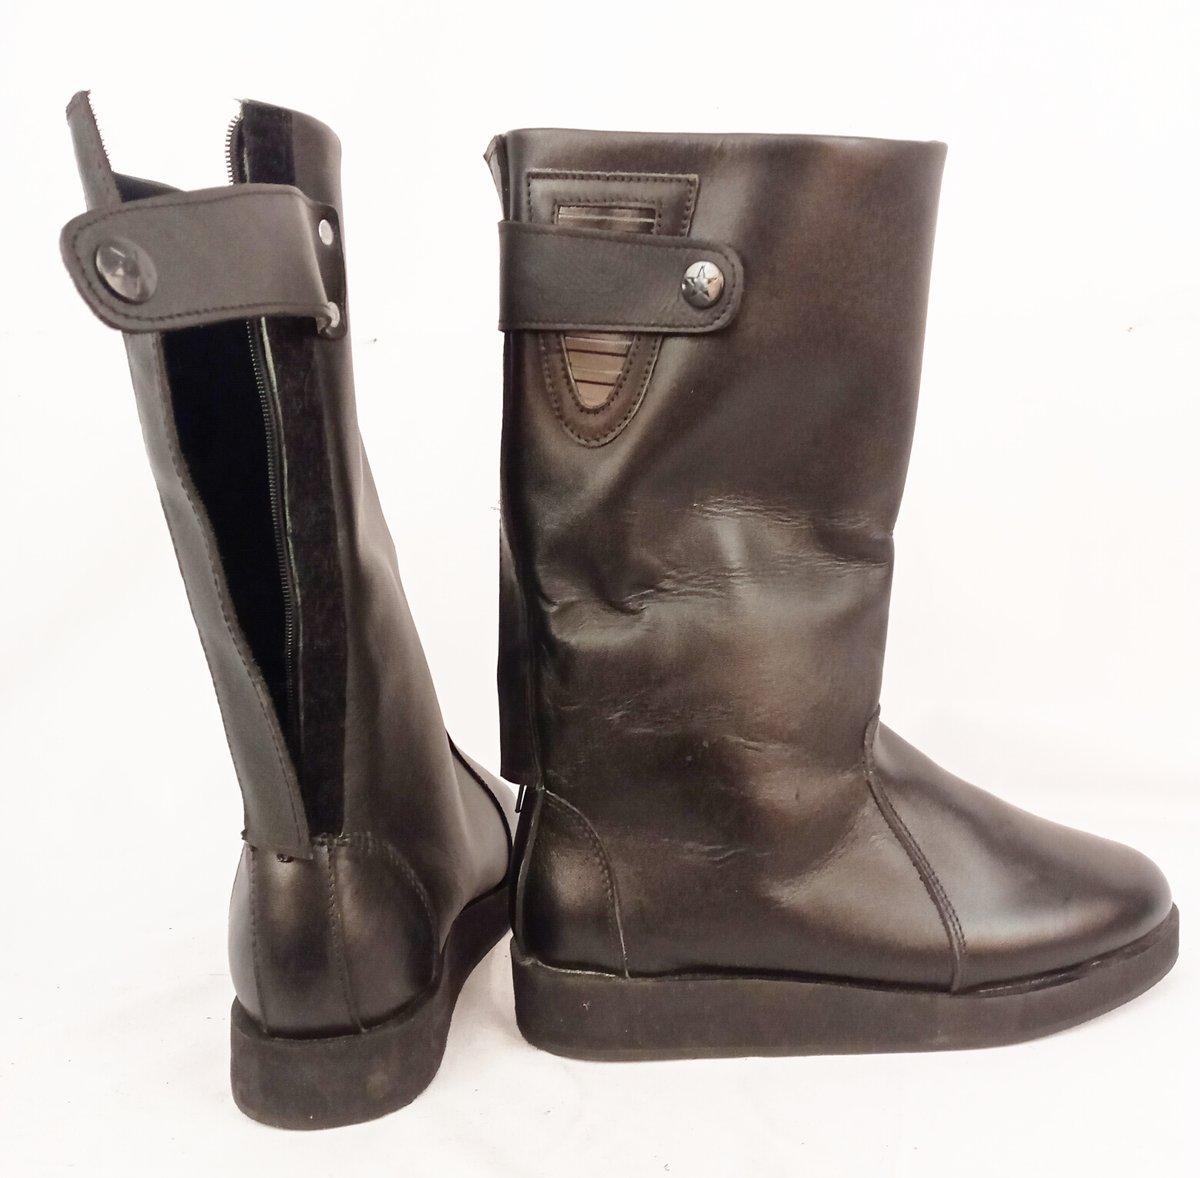 Image of #8 - B Grade from Stock - Shoe Size EU 39